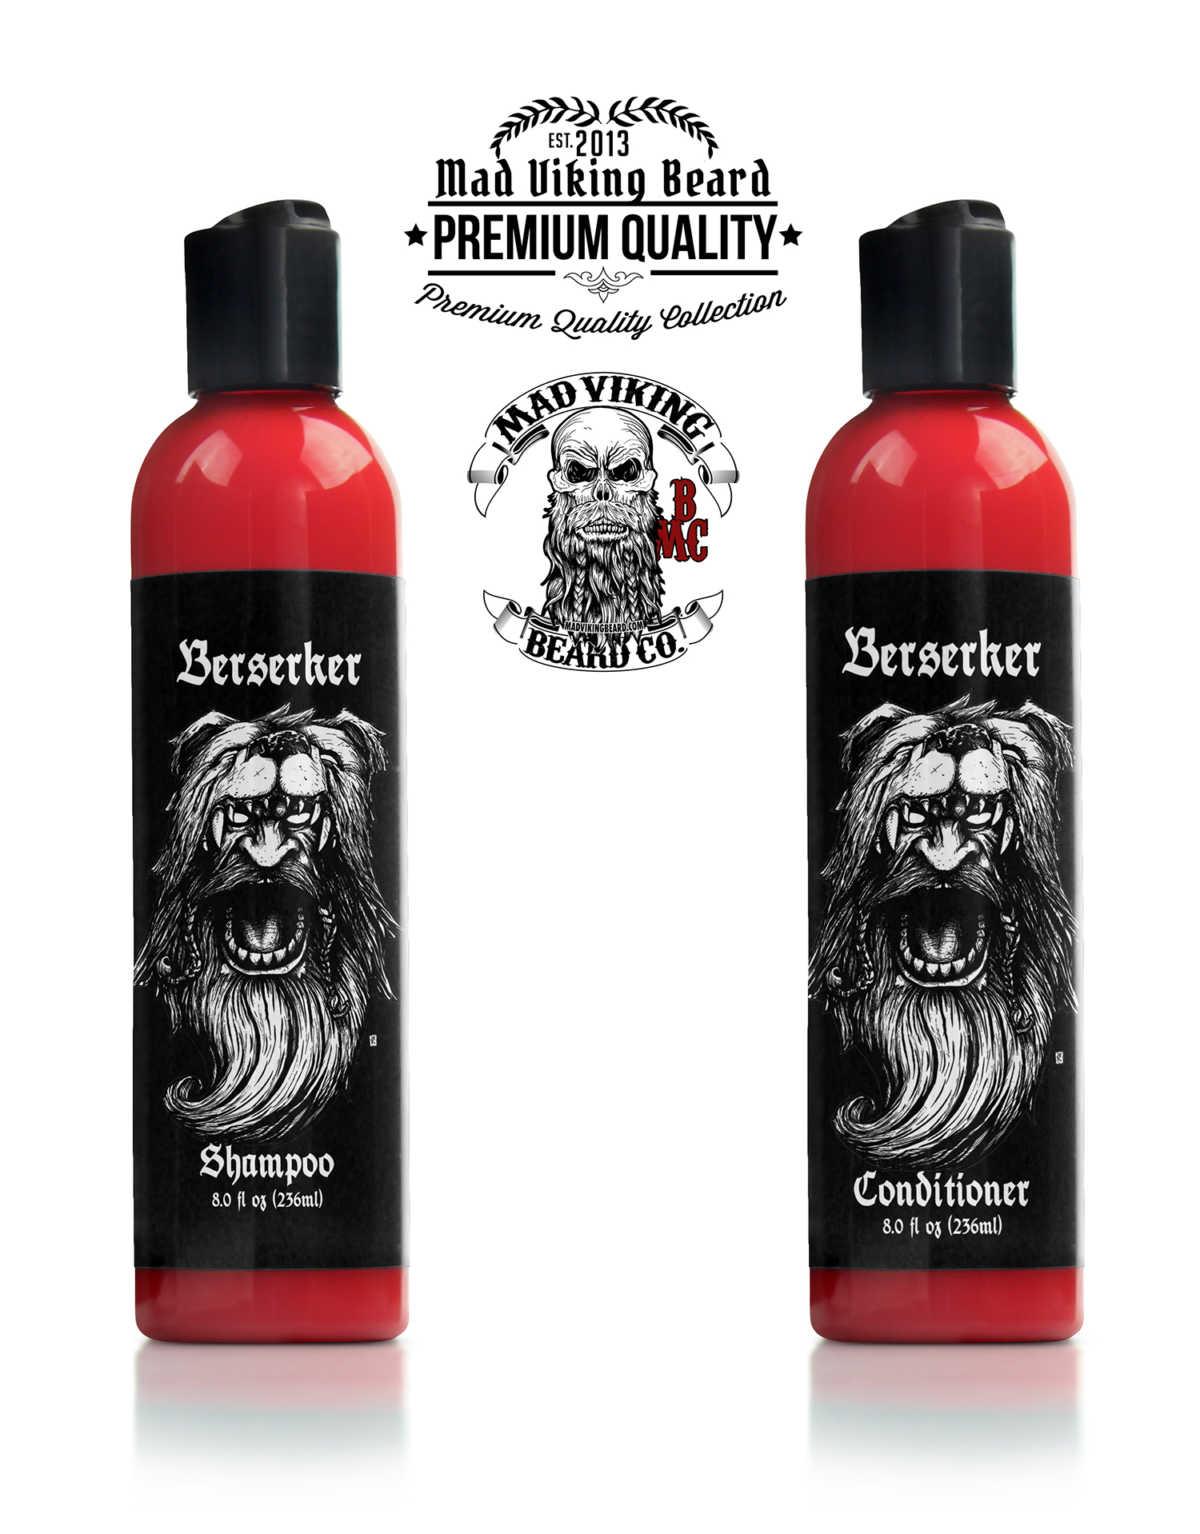 Mad Viking Berserker Shampoo & Conditioner